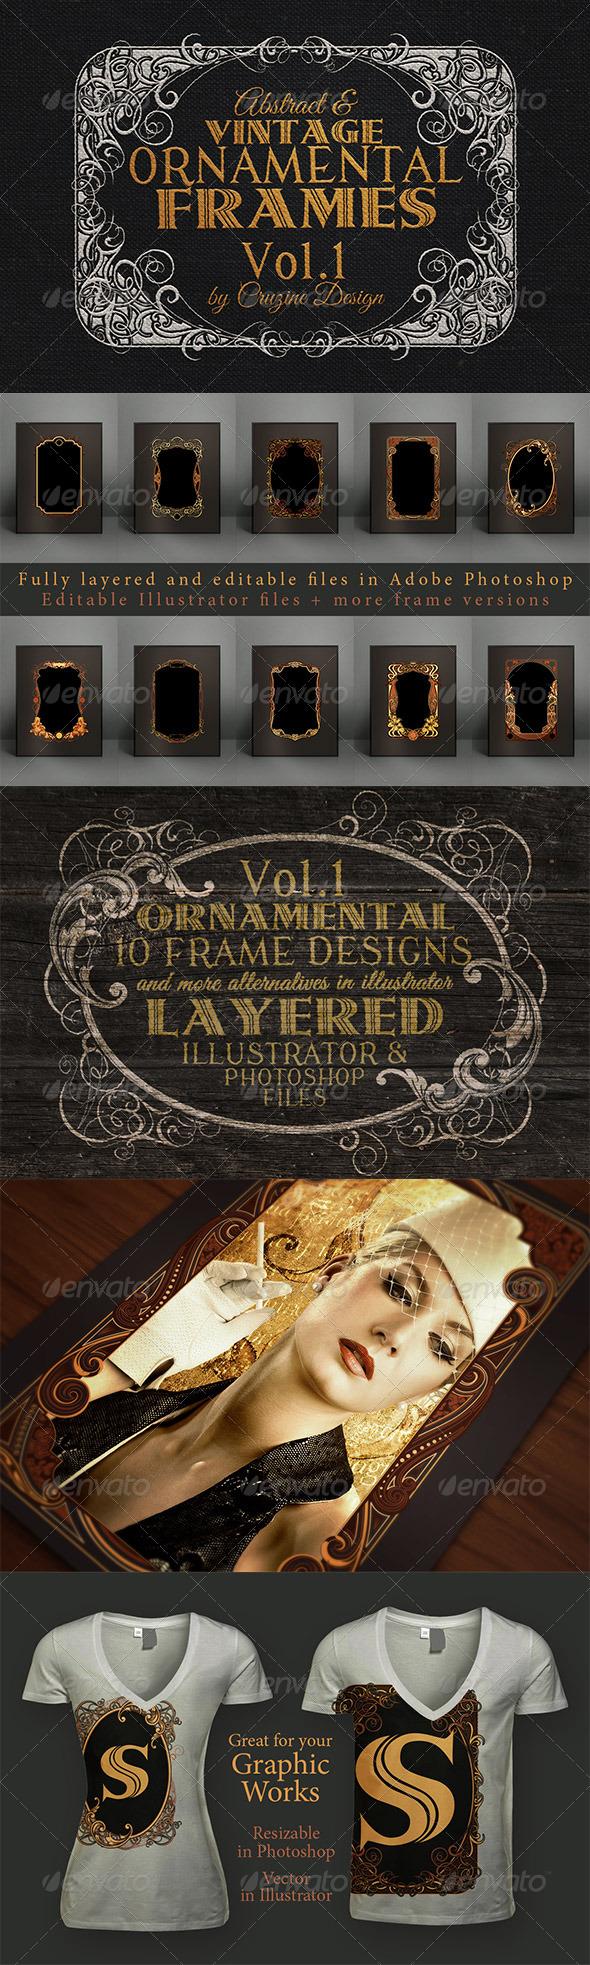 10 Frames Vol.1 - Vintage Ornament - Borders Decorative